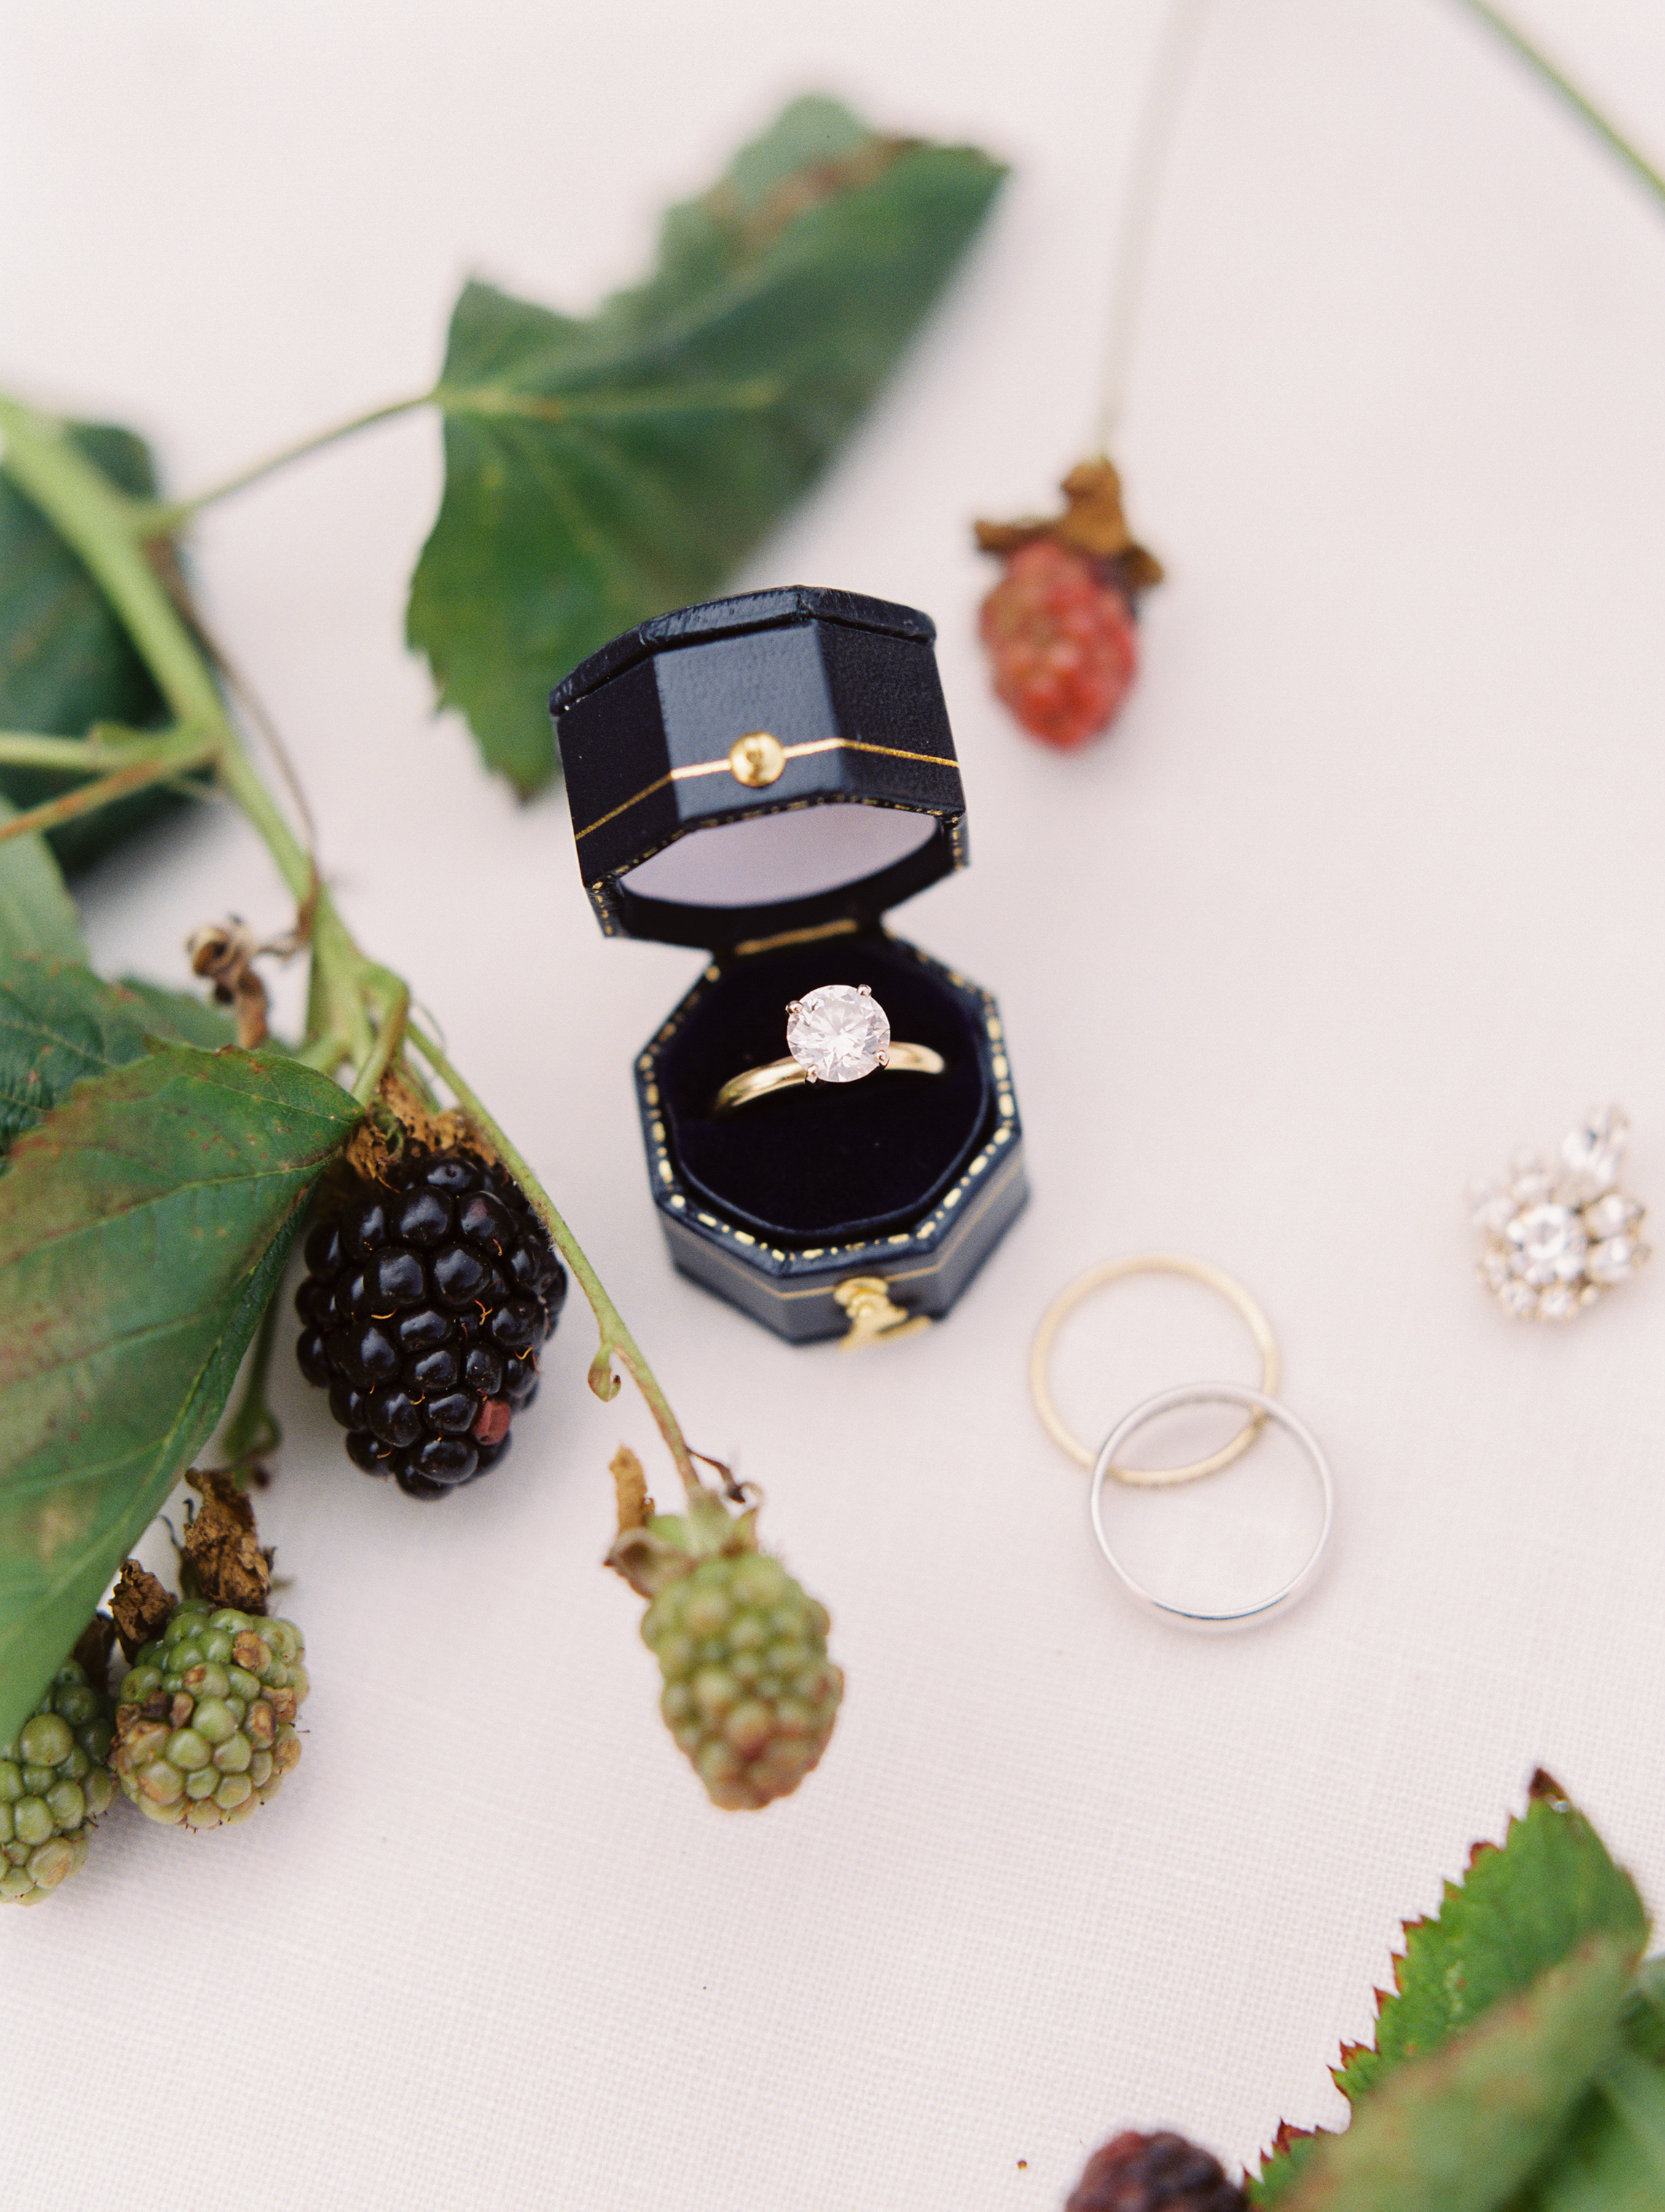 Zoller+Wedding+Details-43.jpg